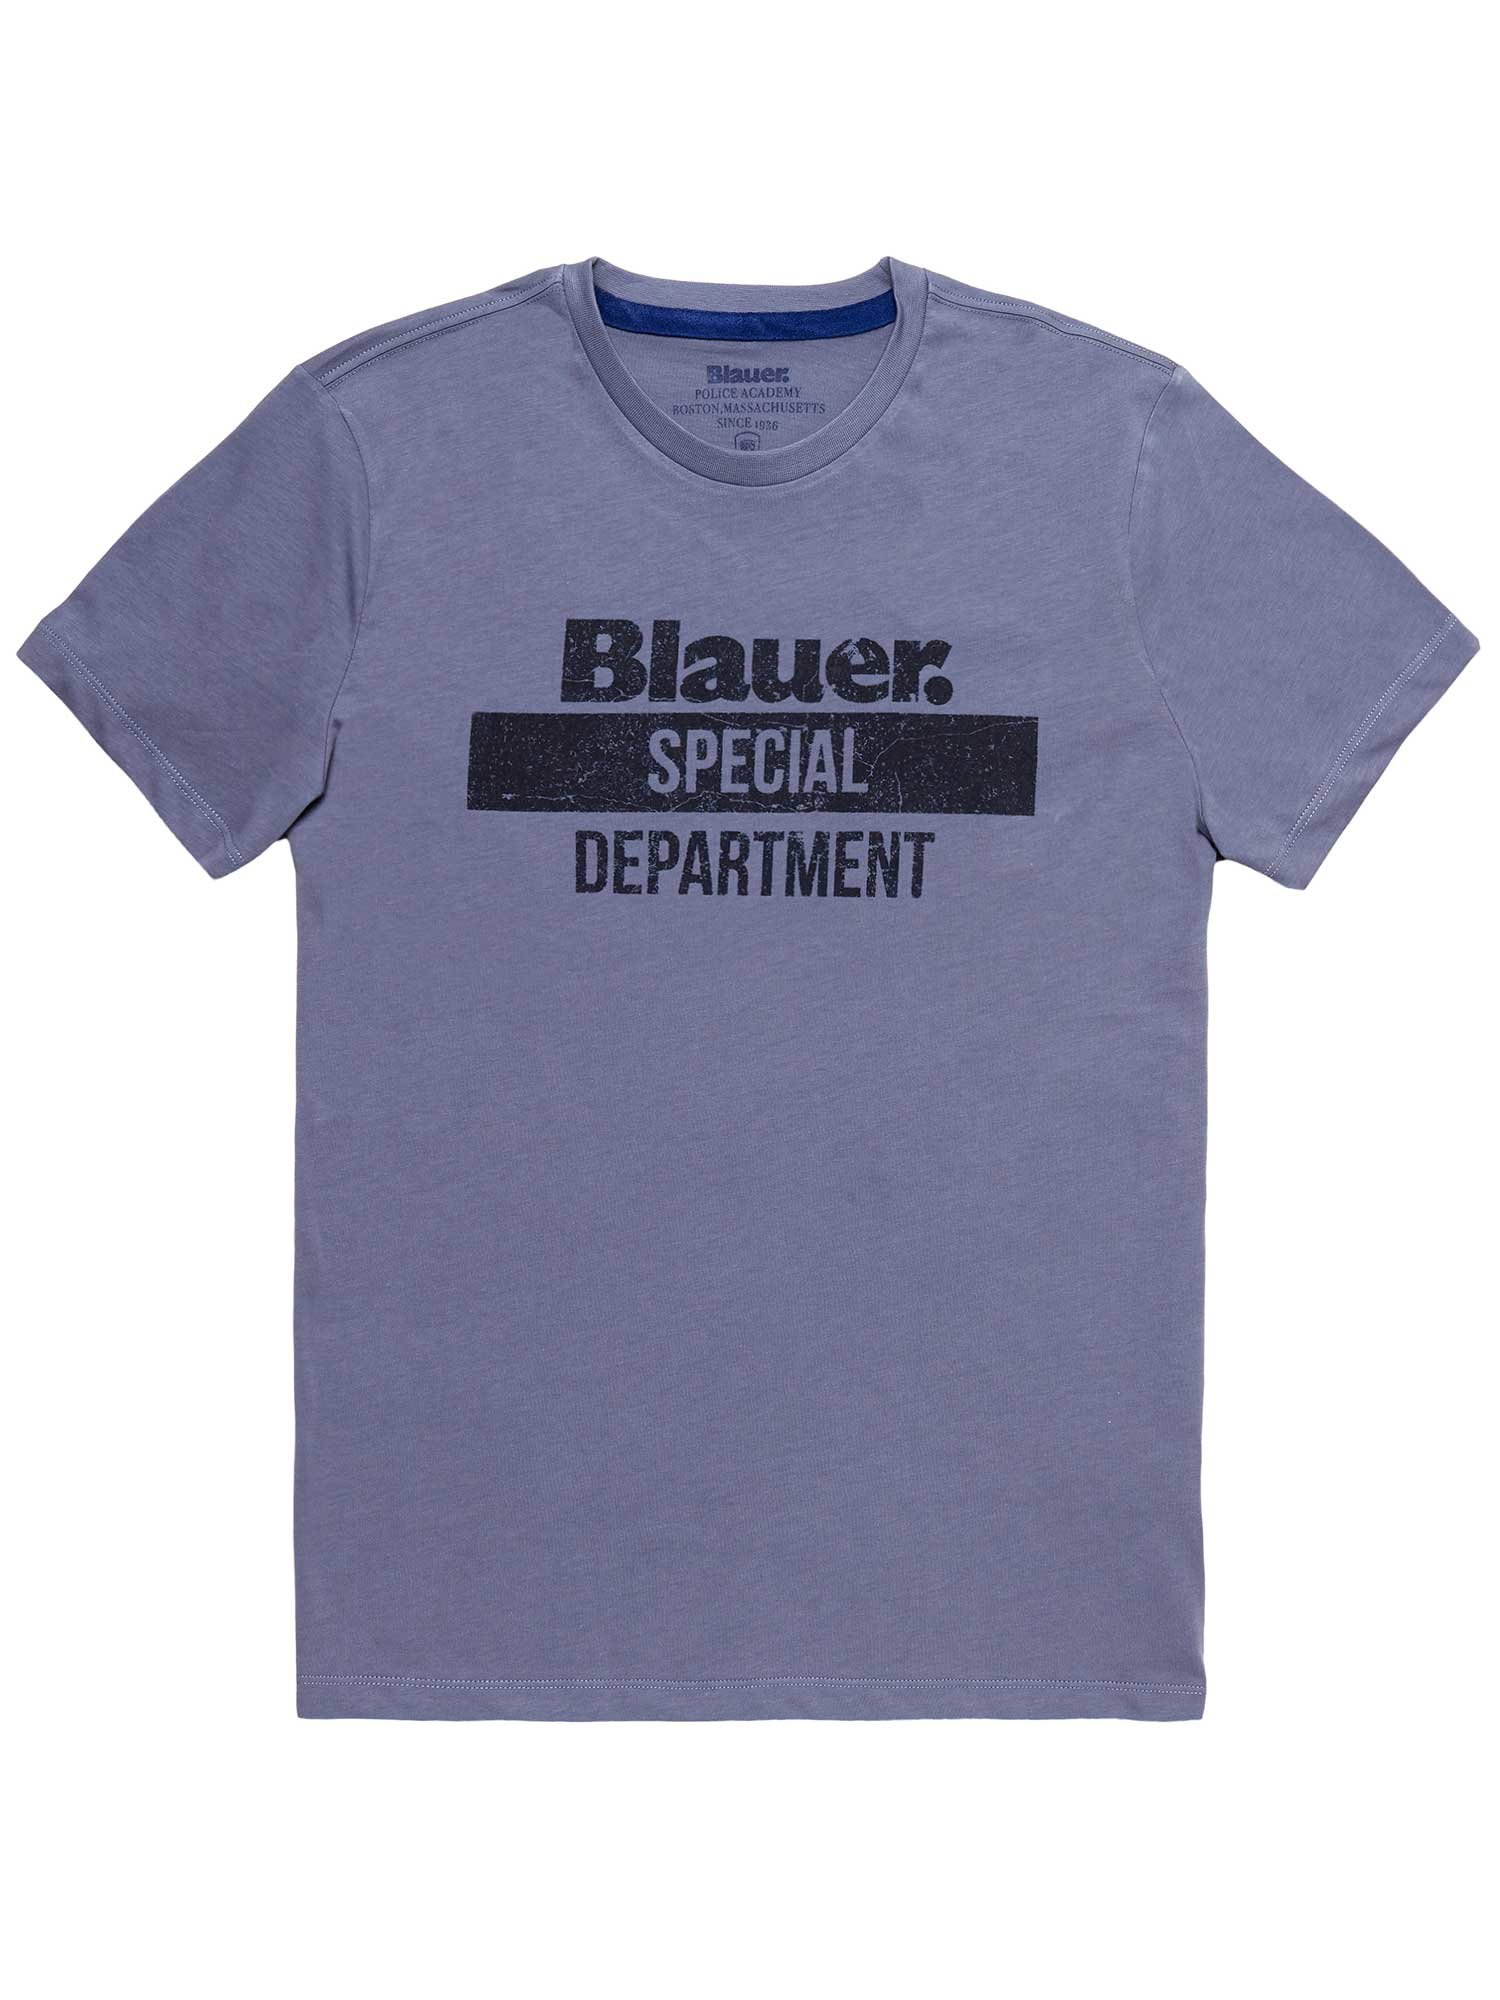 T-SHIRT BLAUER SPECIAL DEPARTMENT - Avio Scuro - Blauer